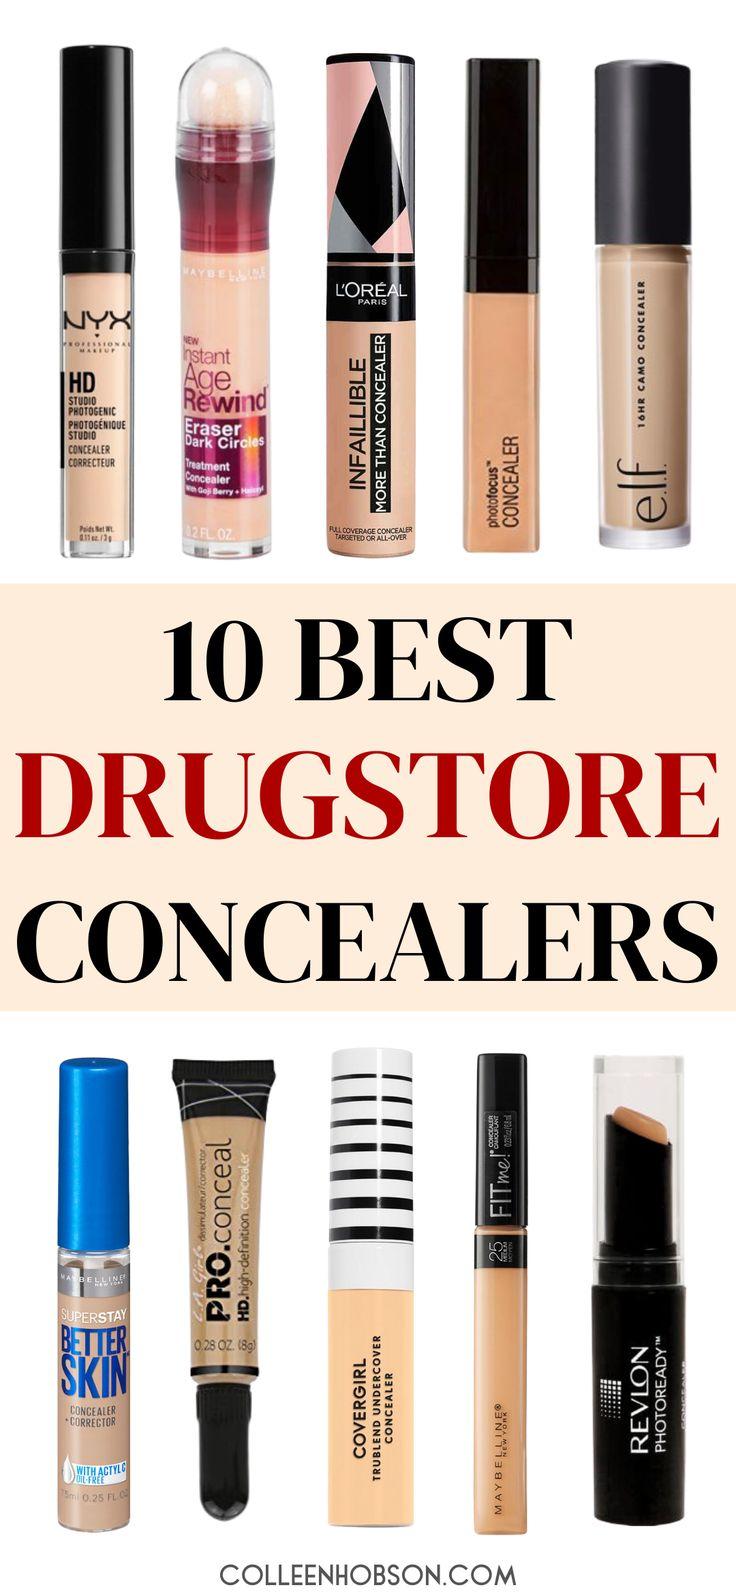 Top 10 best drugstore concealers for covering dark under